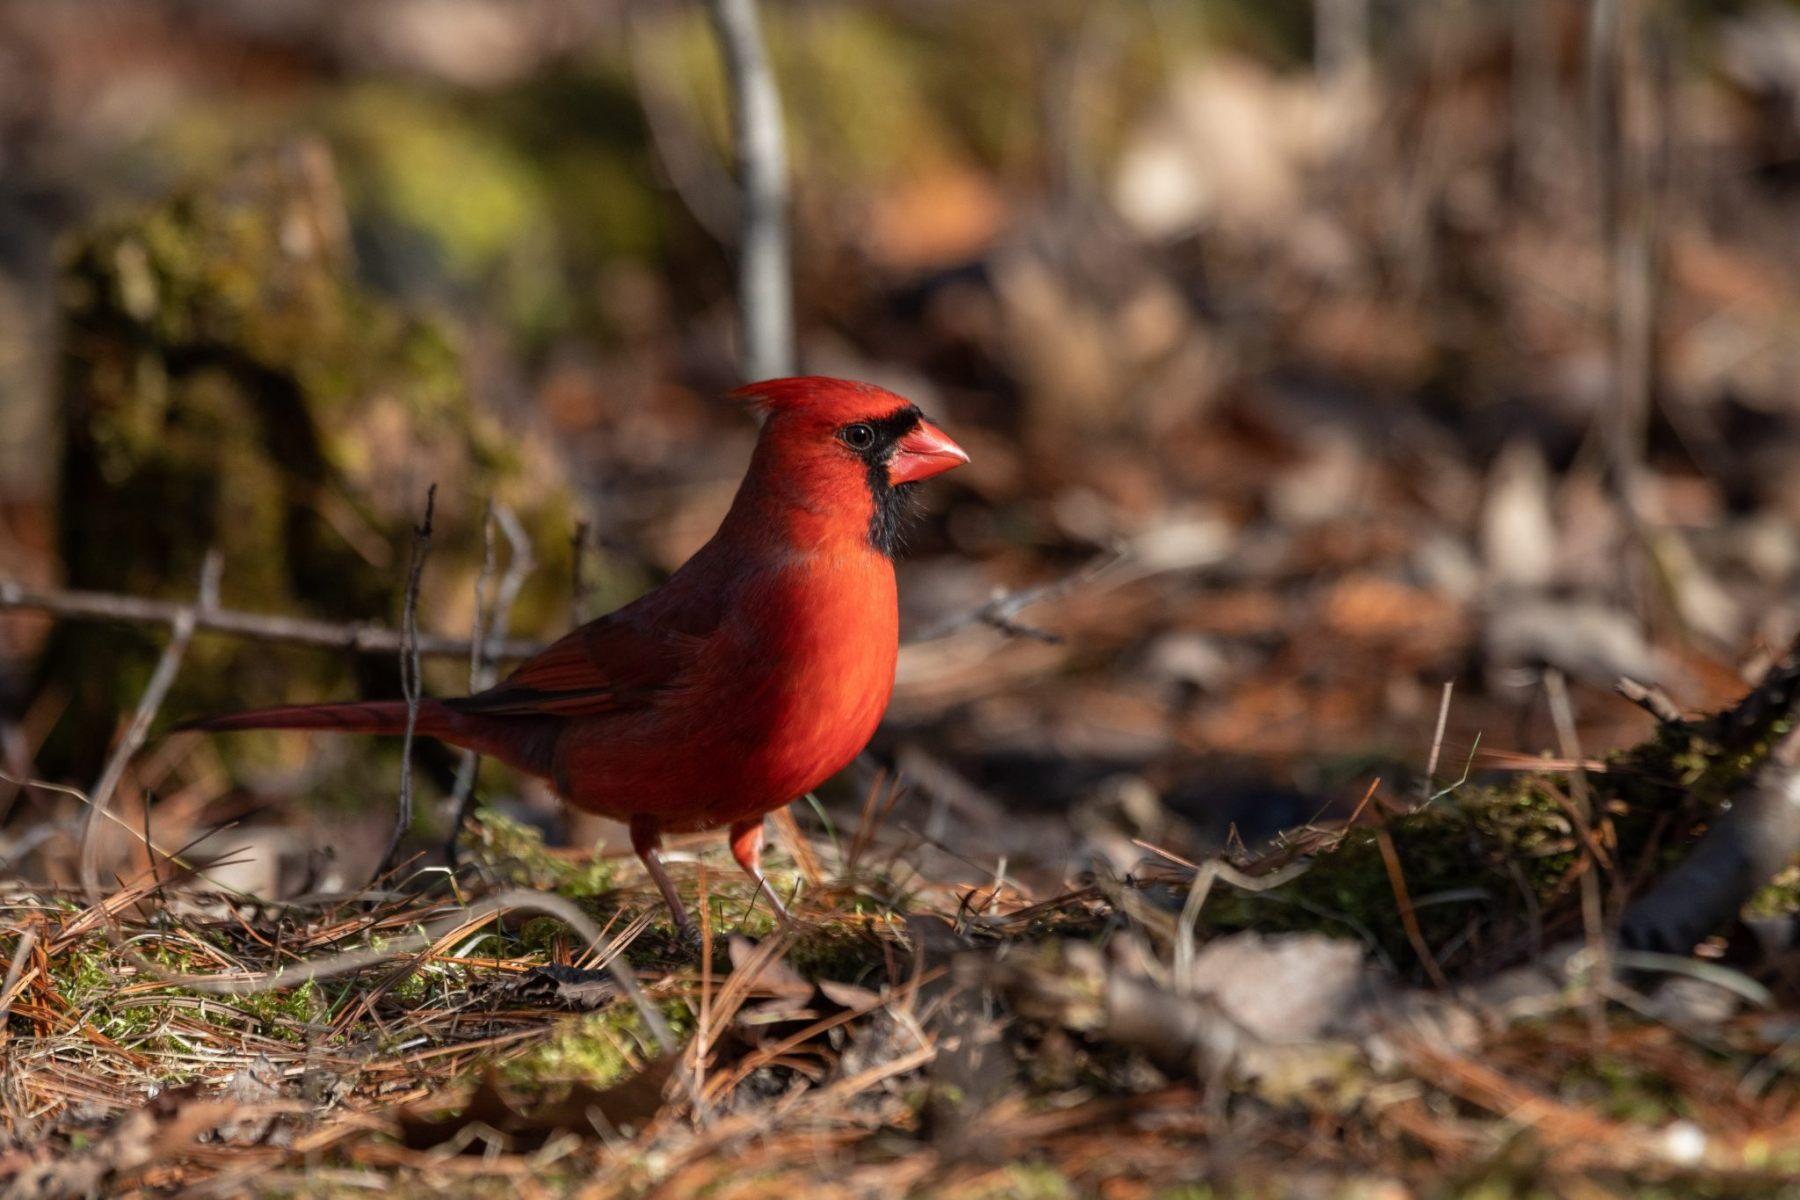 Northern Cardinal by Nicole Watson